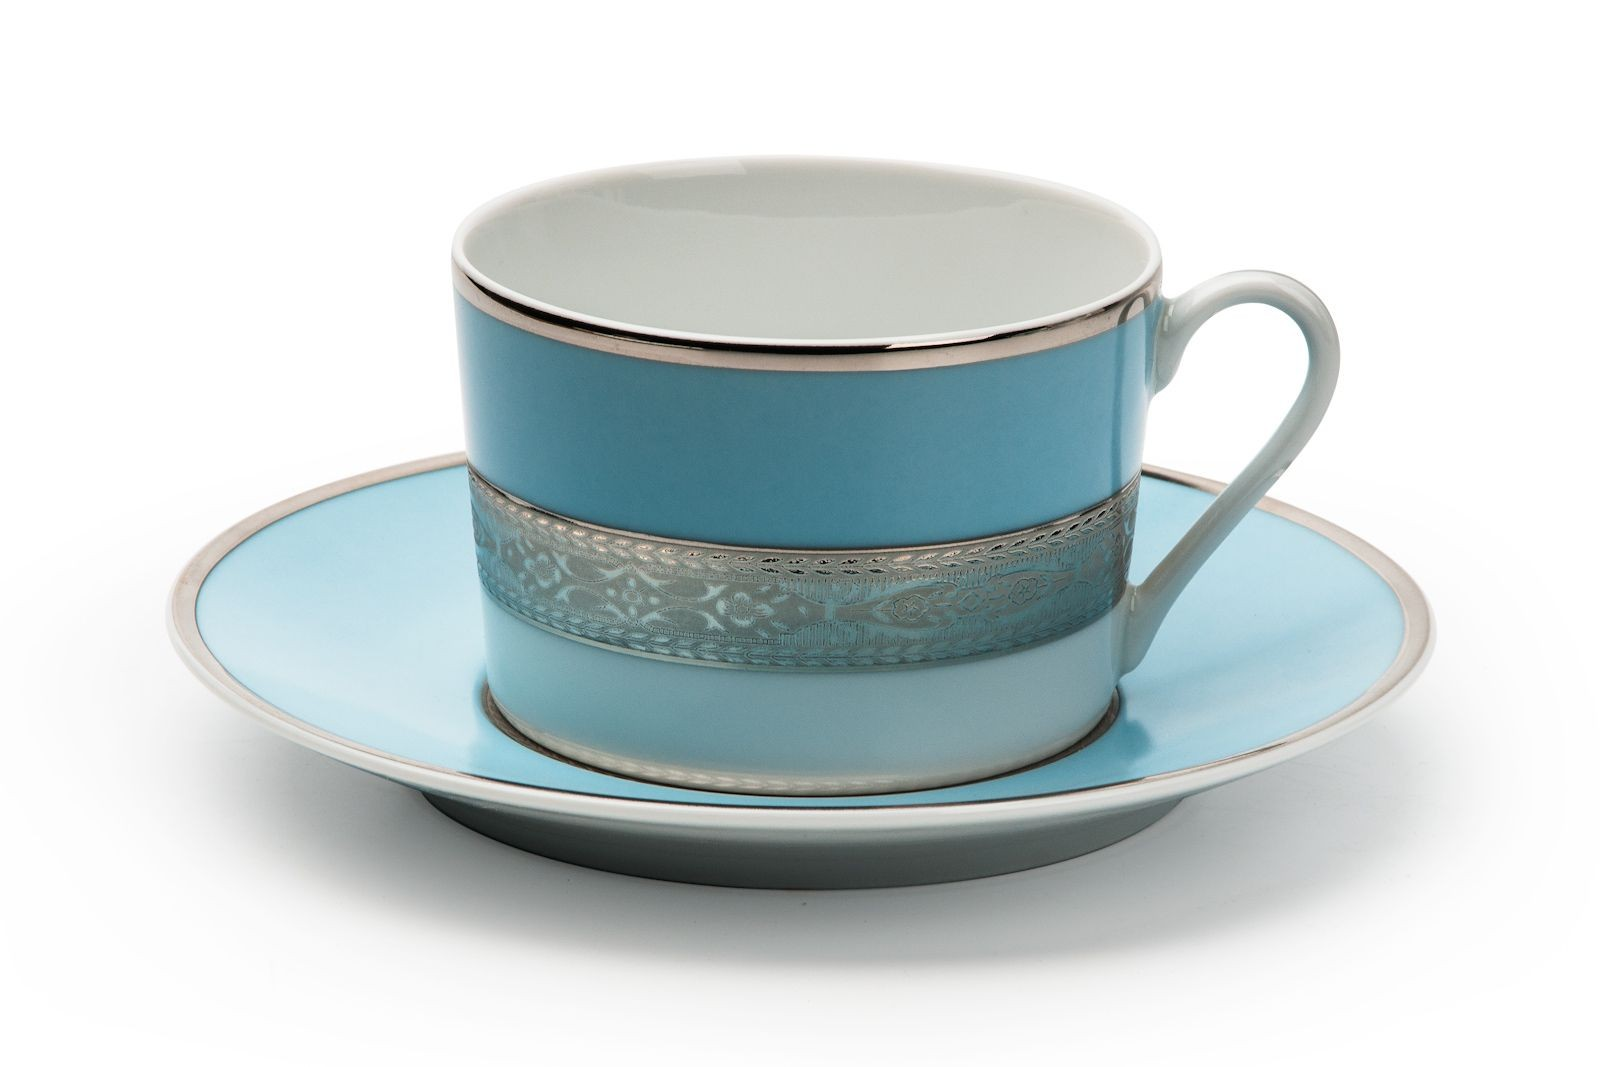 Фарфоровый набор чайных пар MONACO TURQUOISE MONALISA